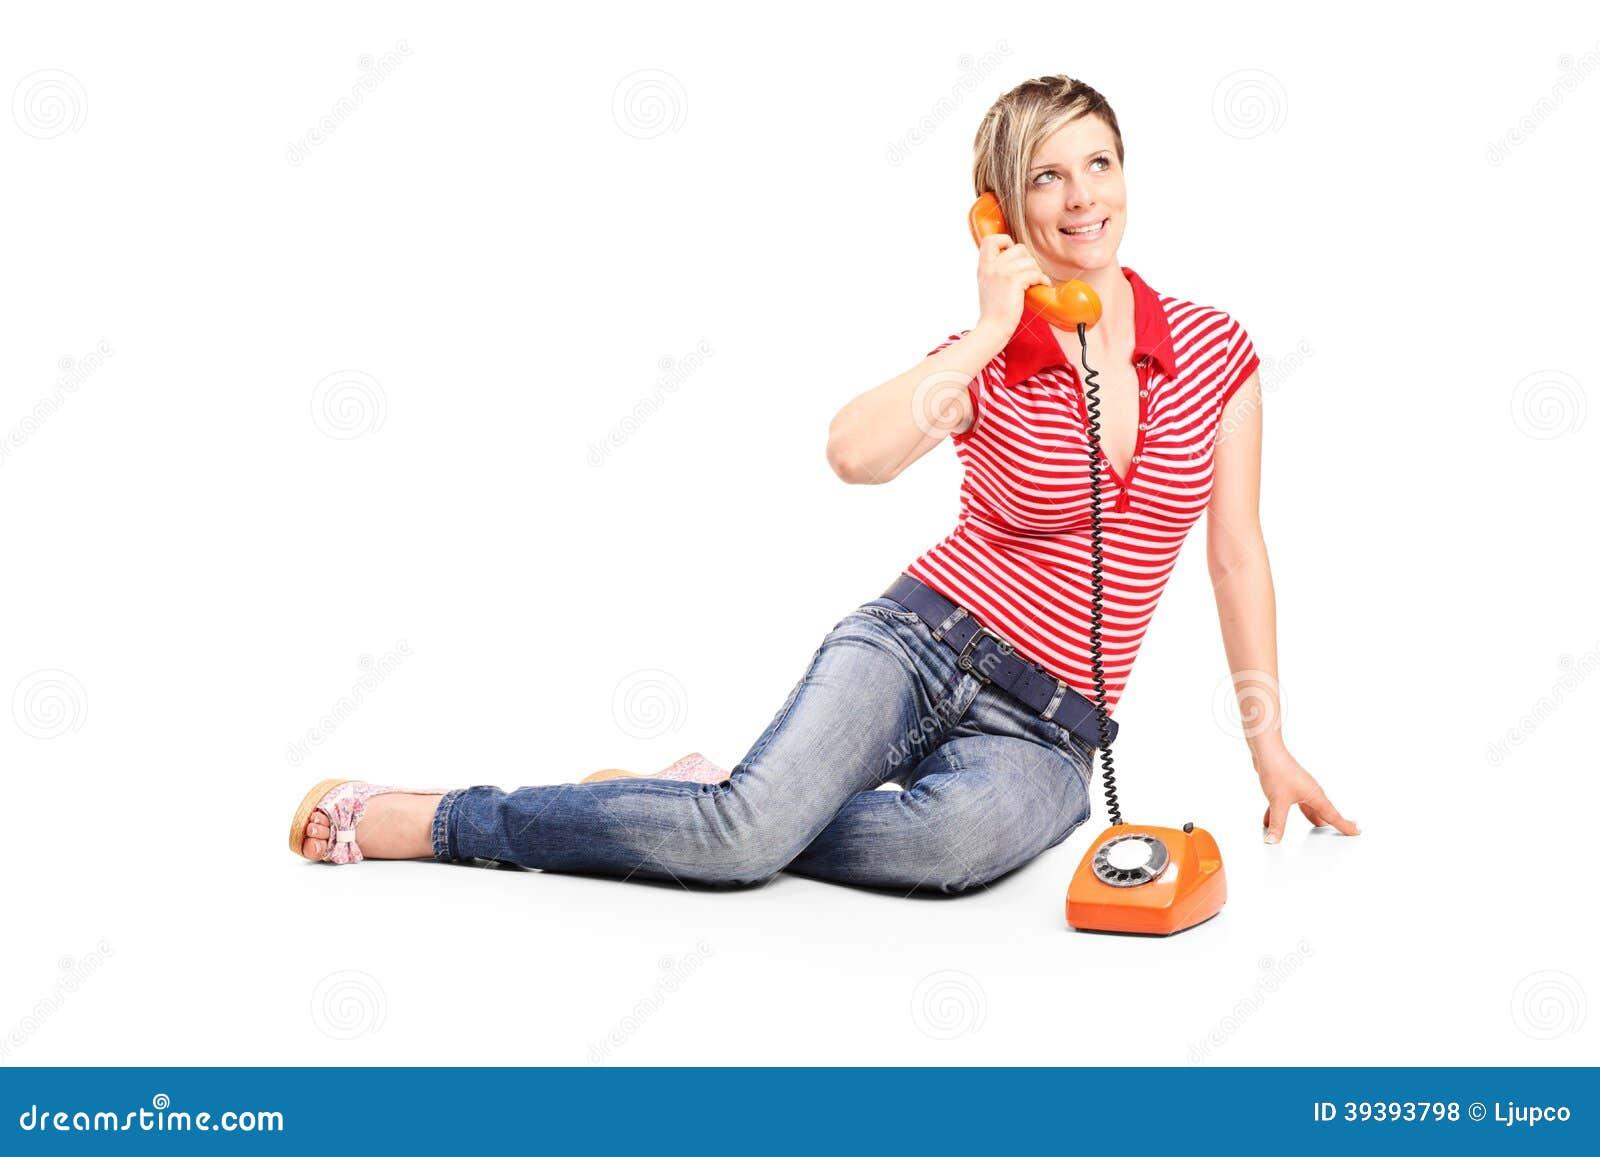 Jong meisje die op een uitstekende telefoon spreken